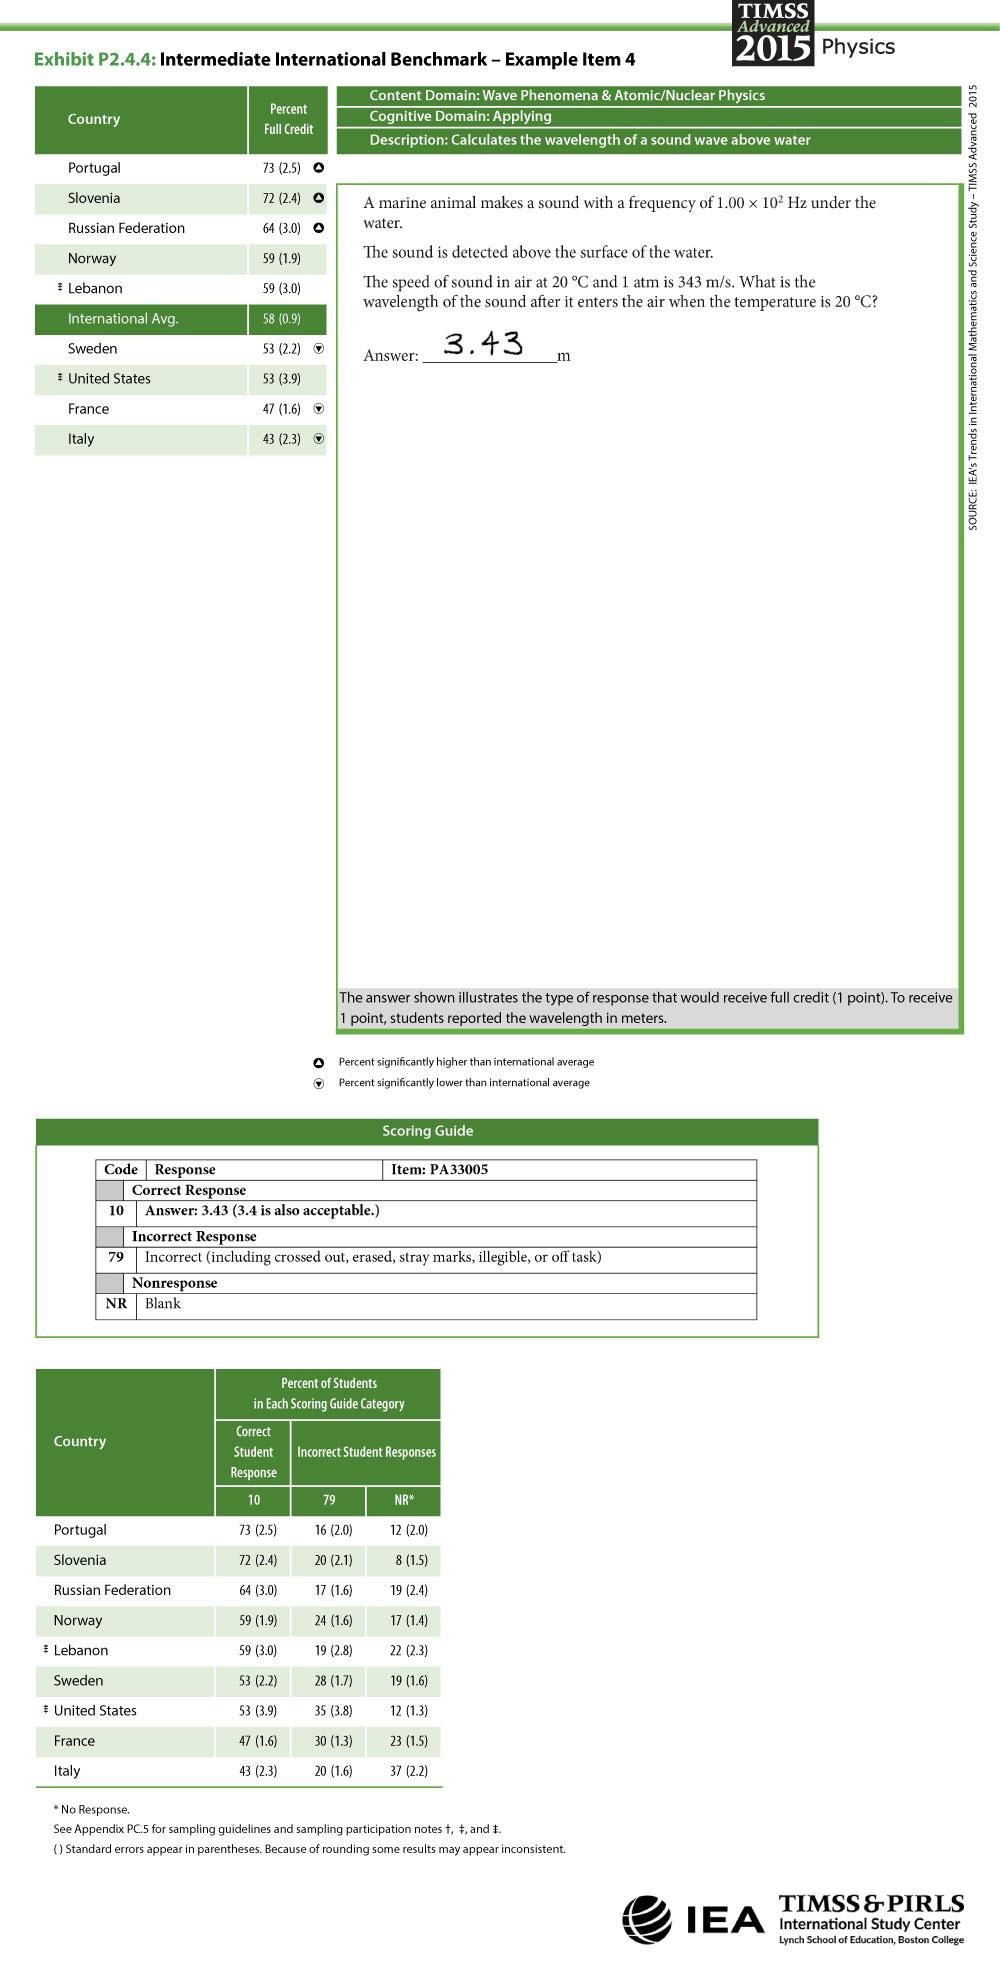 Intermediate International Benchmark Item 4